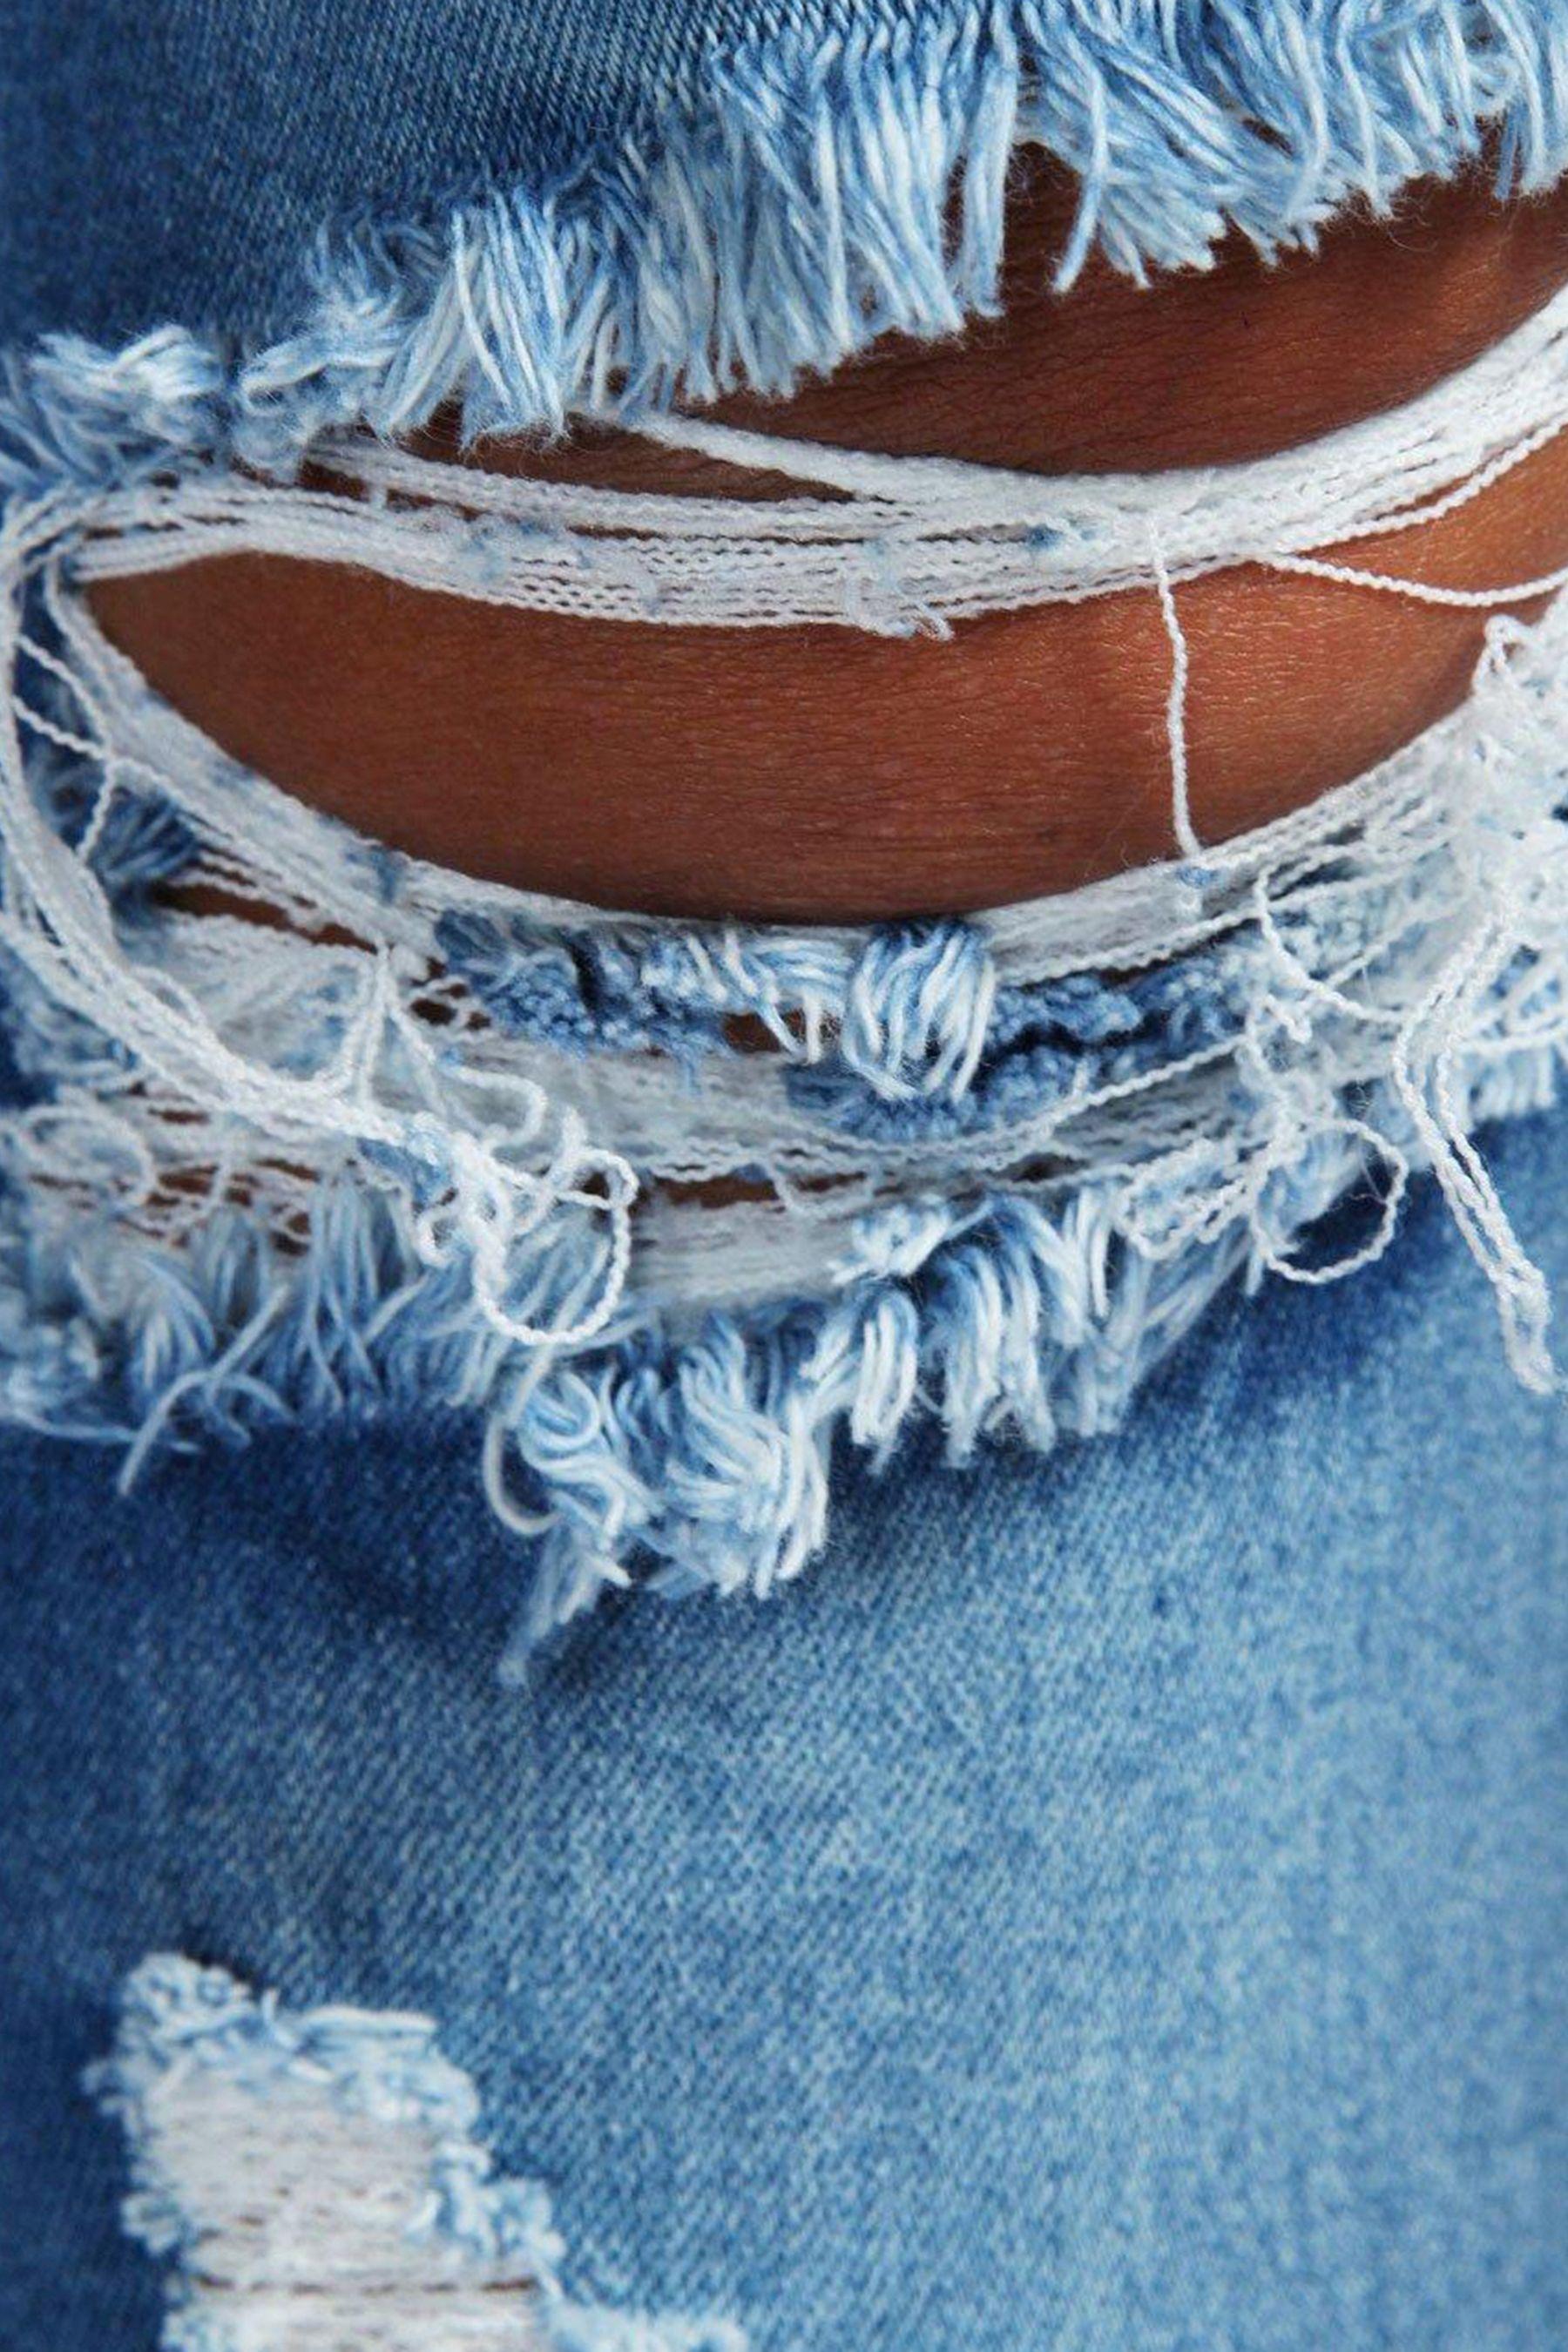 e96c25186e Womens Boohoo Low Rise Distressed Rip Knee Skinny Jeans - Blue ...